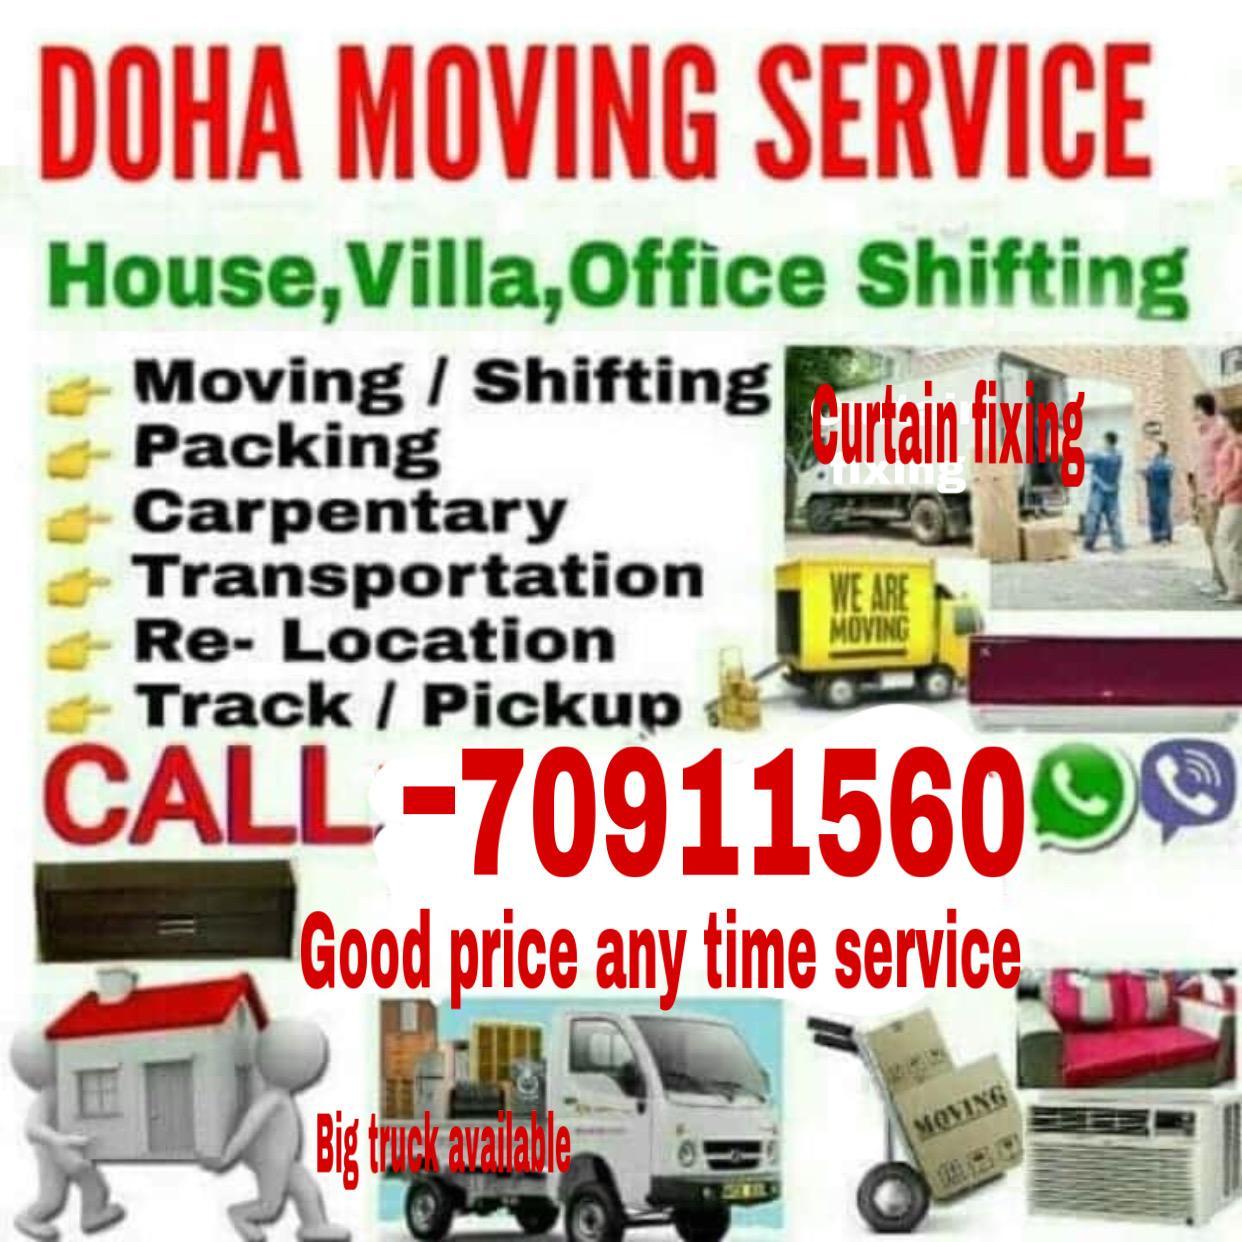 Good Prices -Moving/Shifting/Carpenter transport